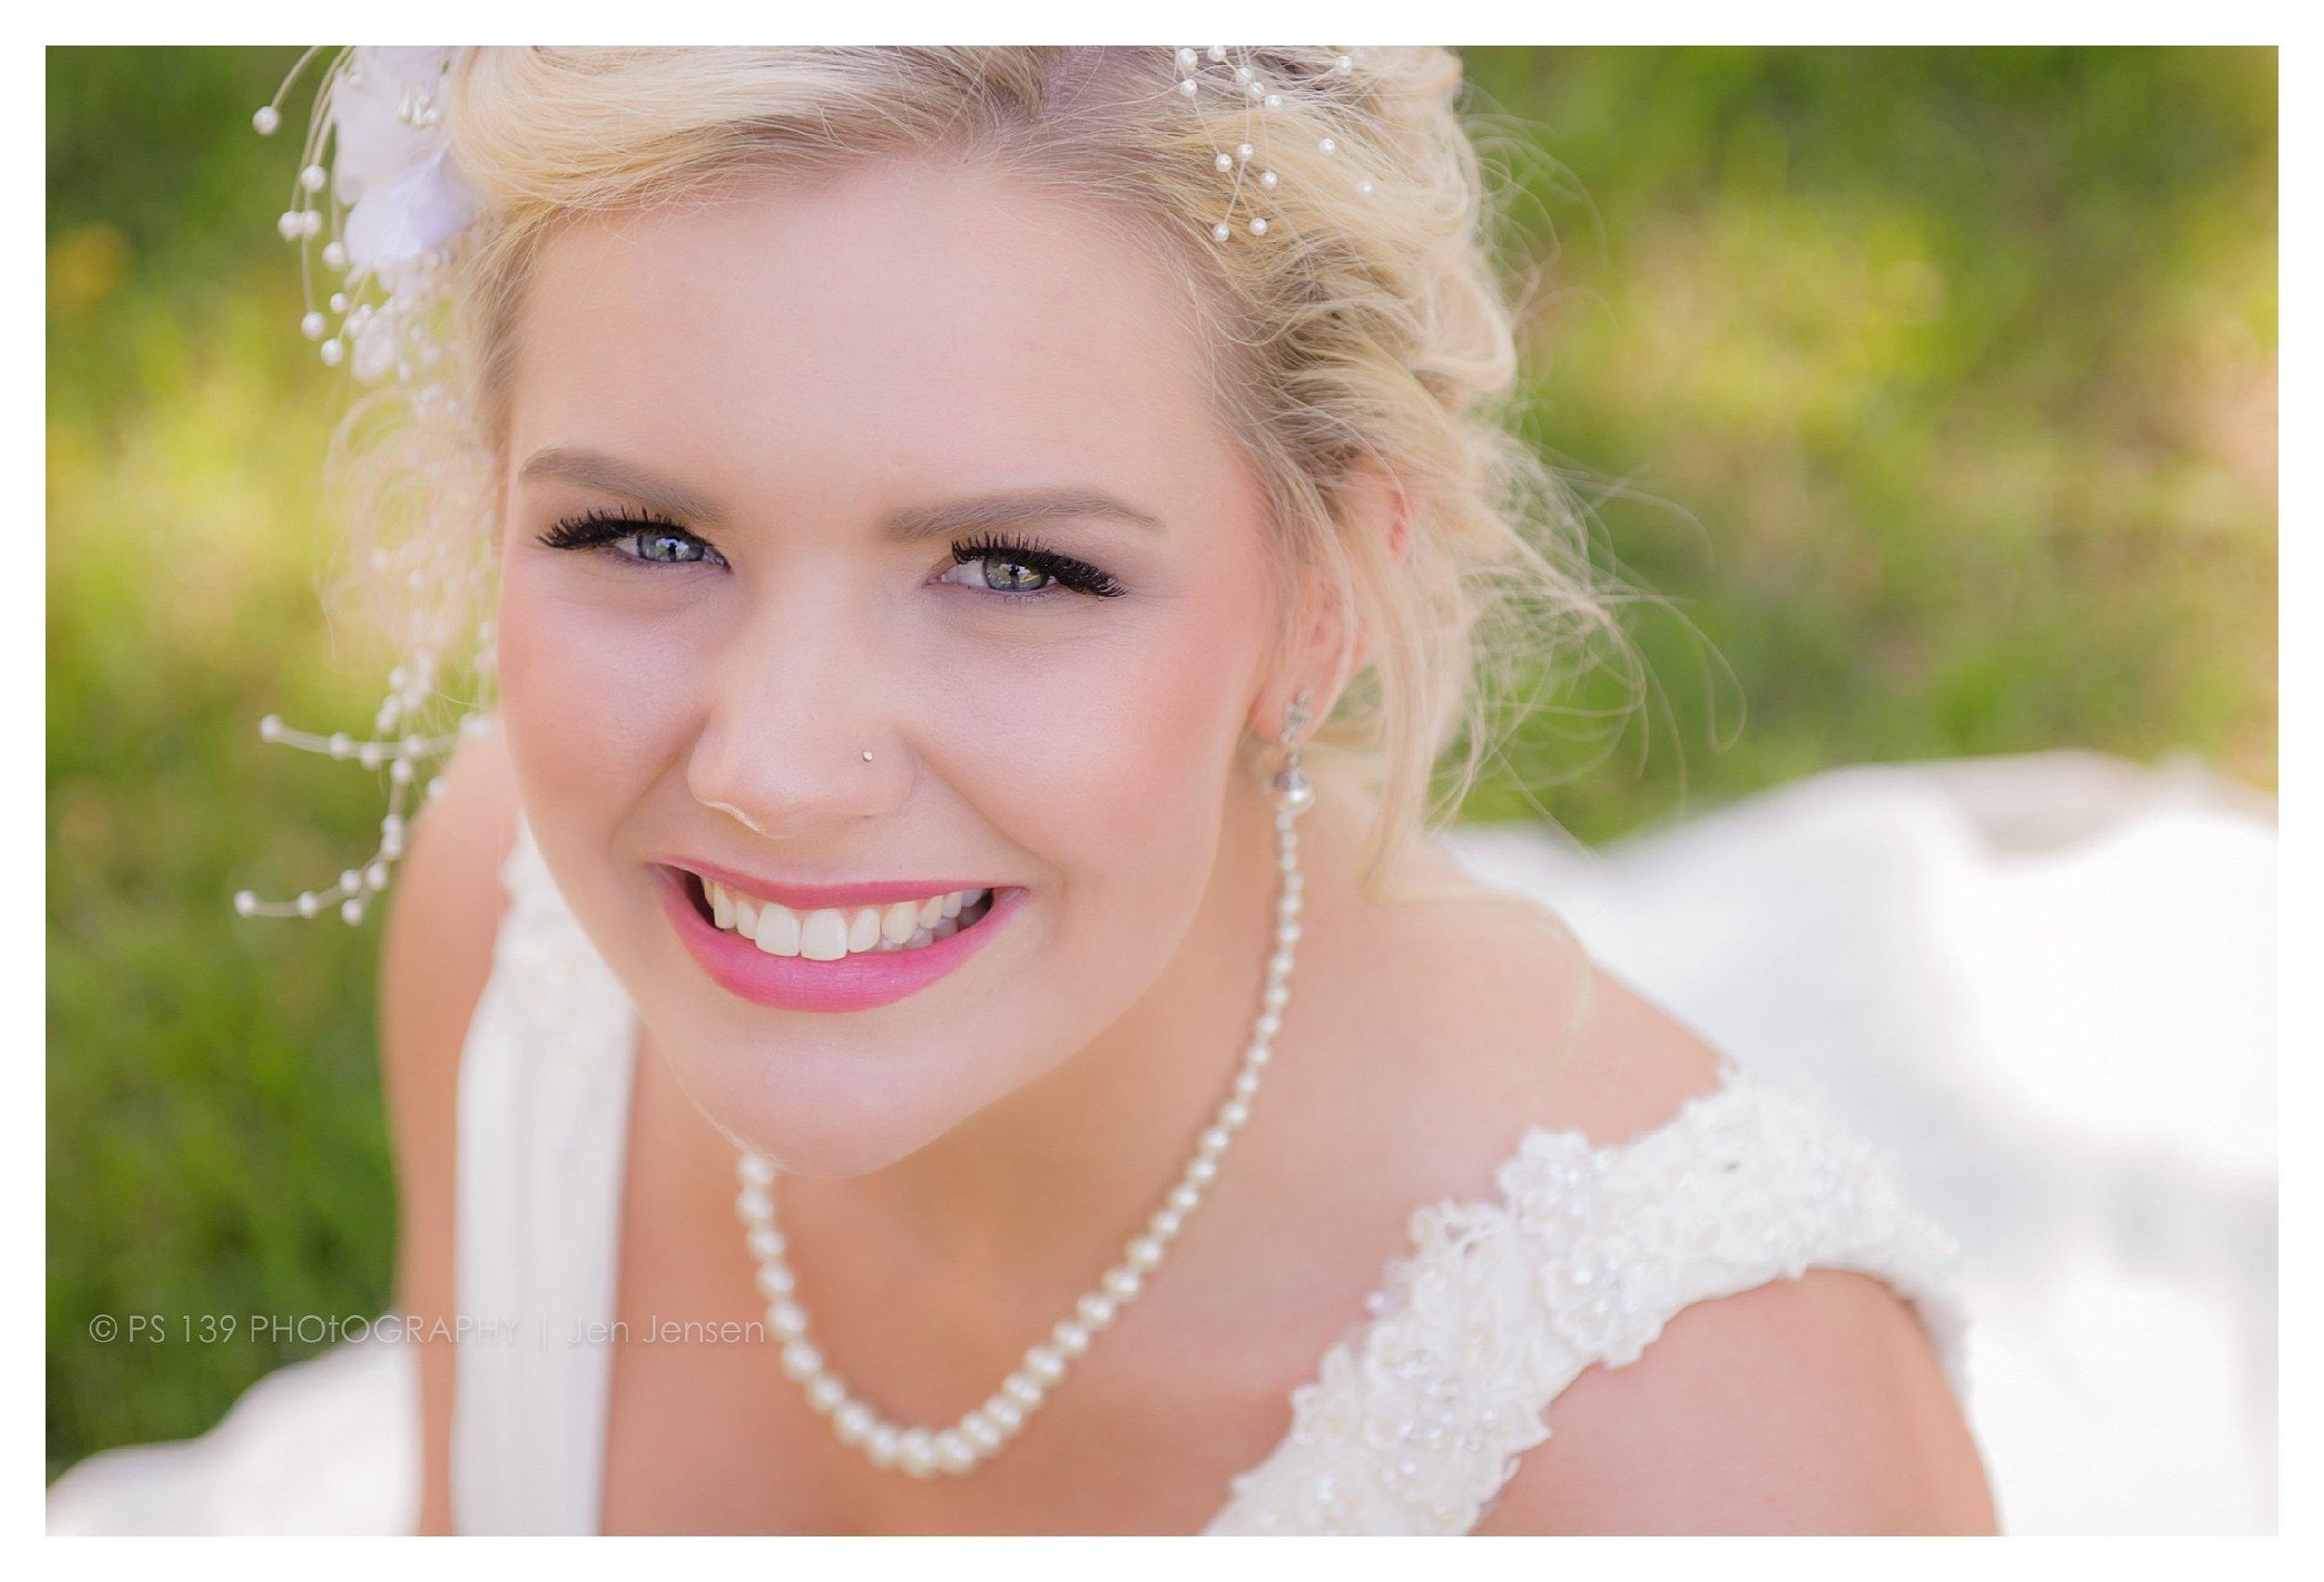 oregon Illinois oak lane farm wisconsin wedding photographer bayfield wi ps 139 photography jen jensen_0236.jpg